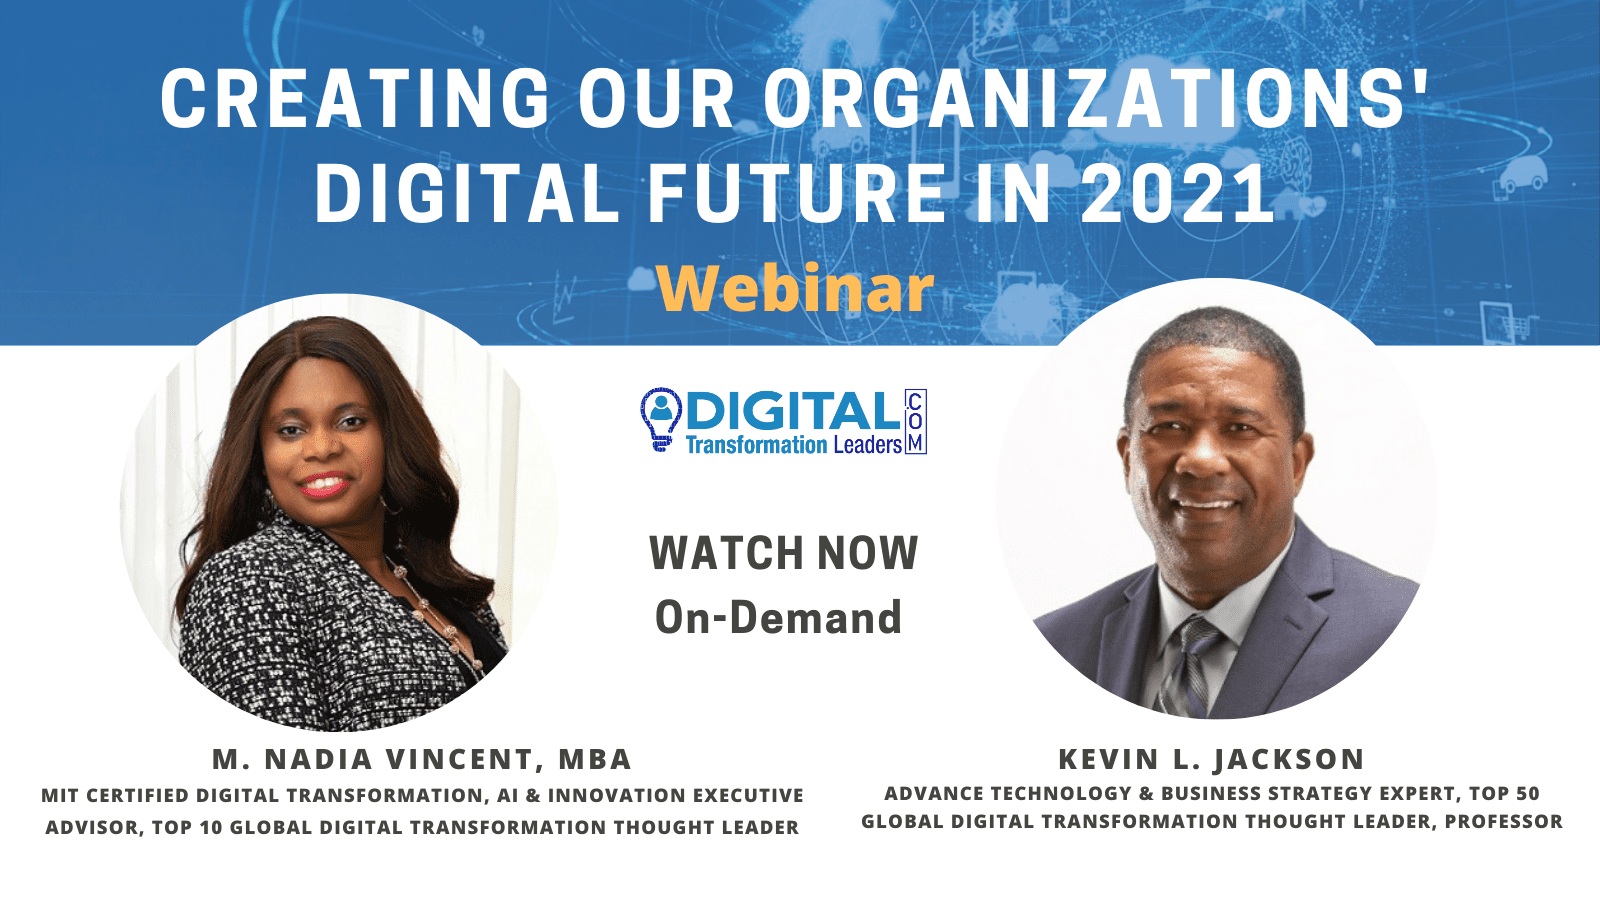 creating our organizations digital futur